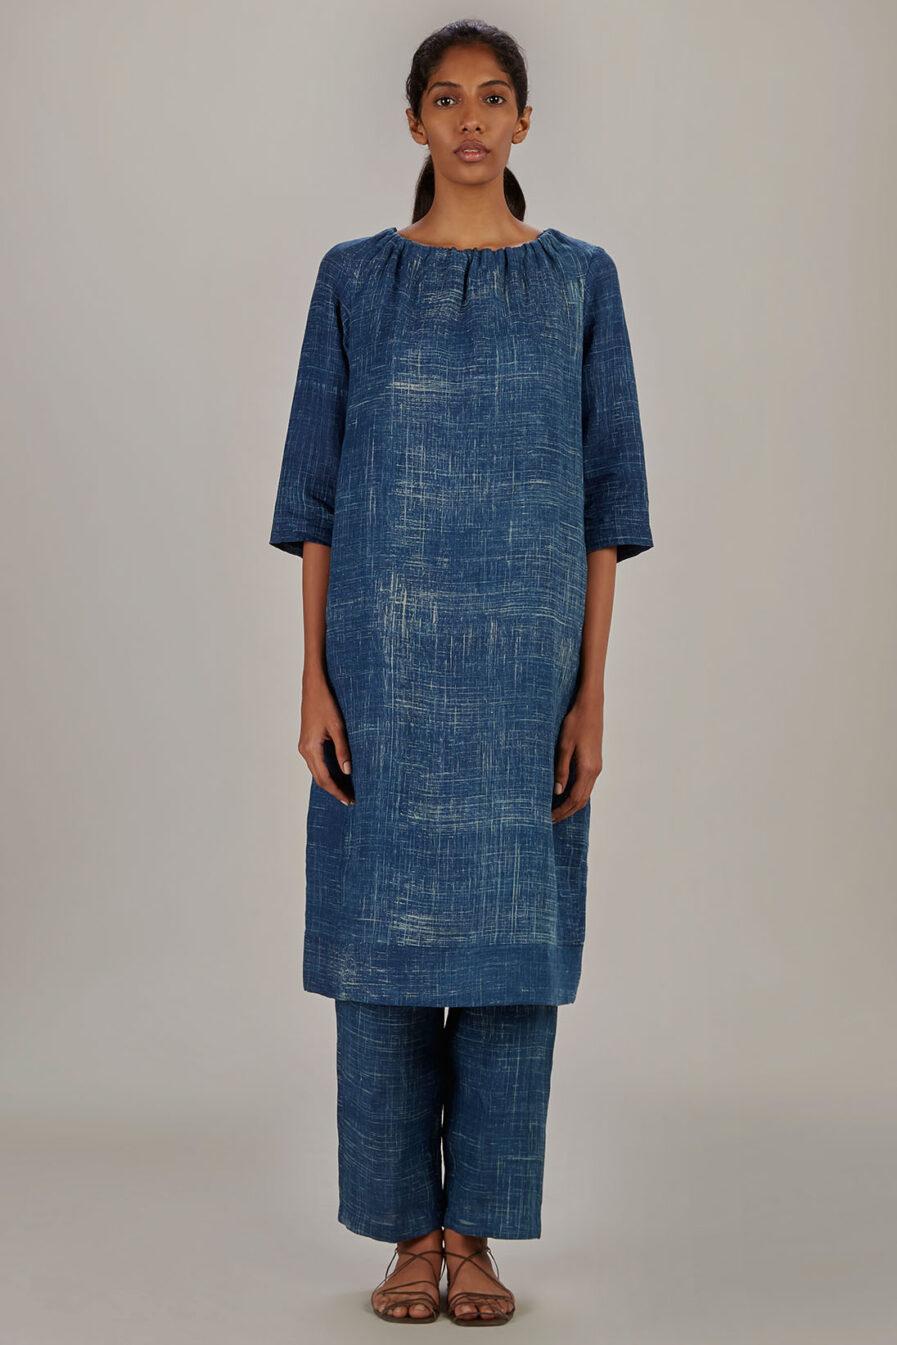 Anavil Indigo Elasticated dress